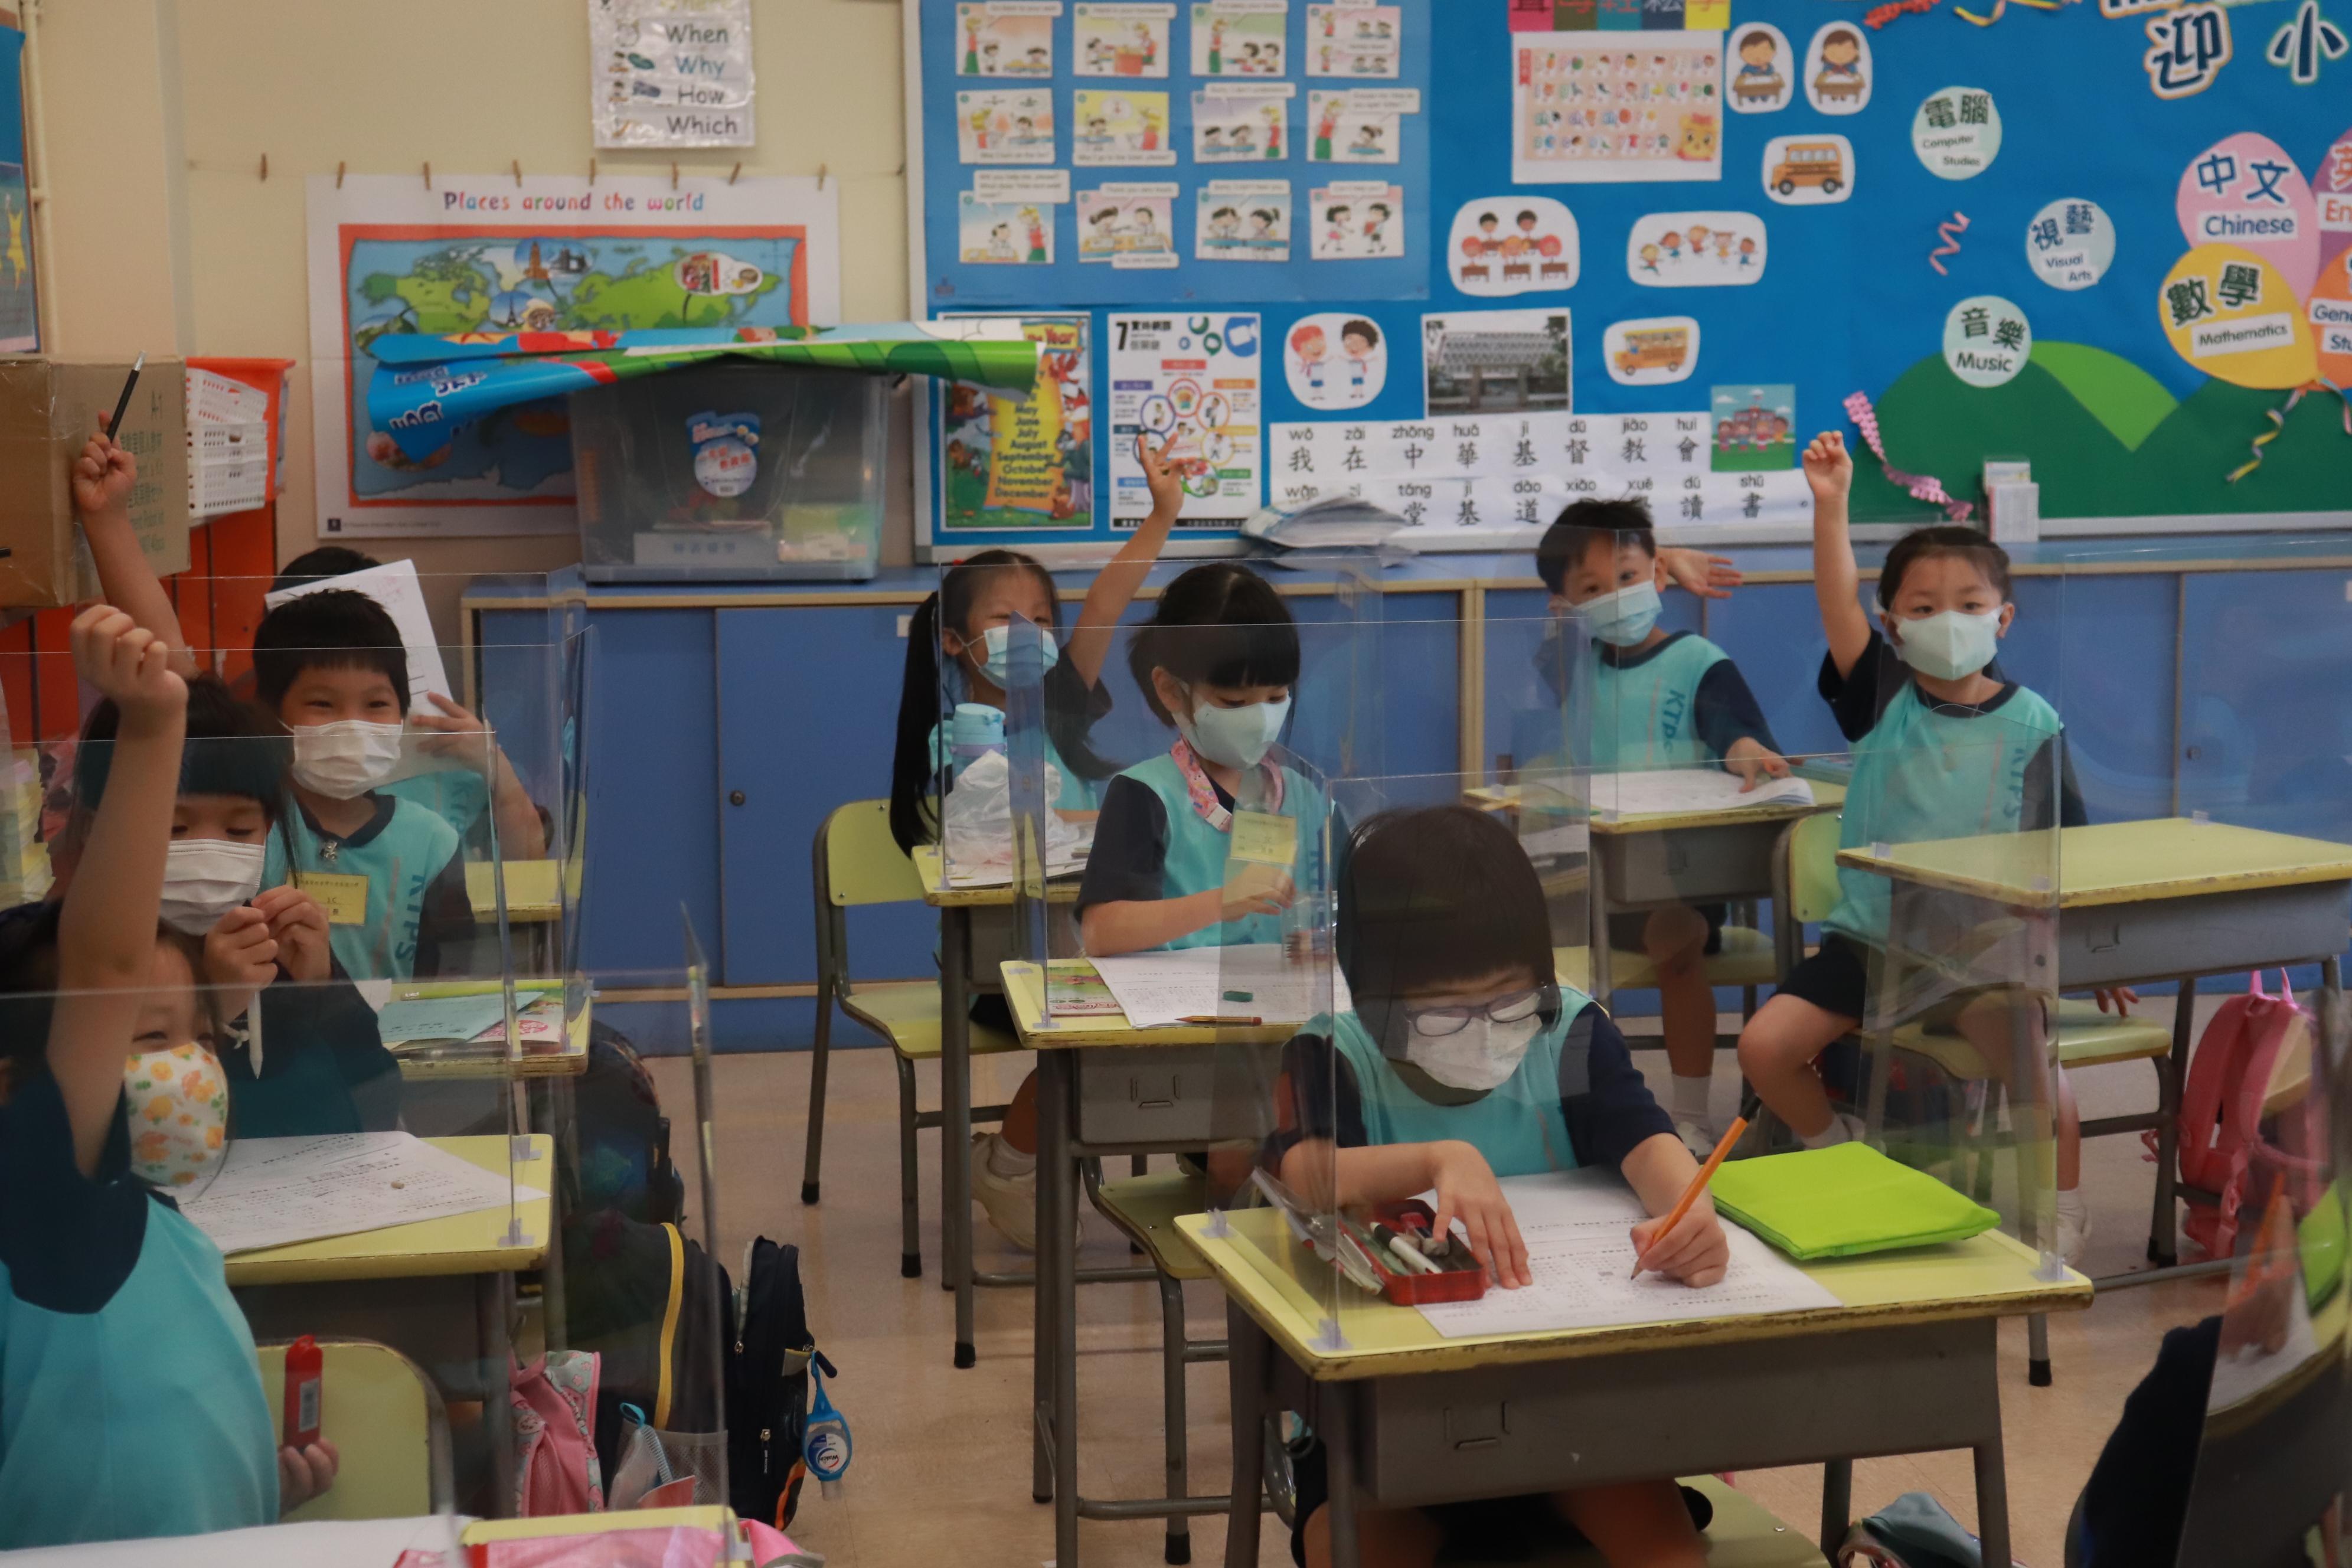 http://keito.school.hk/sites/default/files/img_6701.jpg